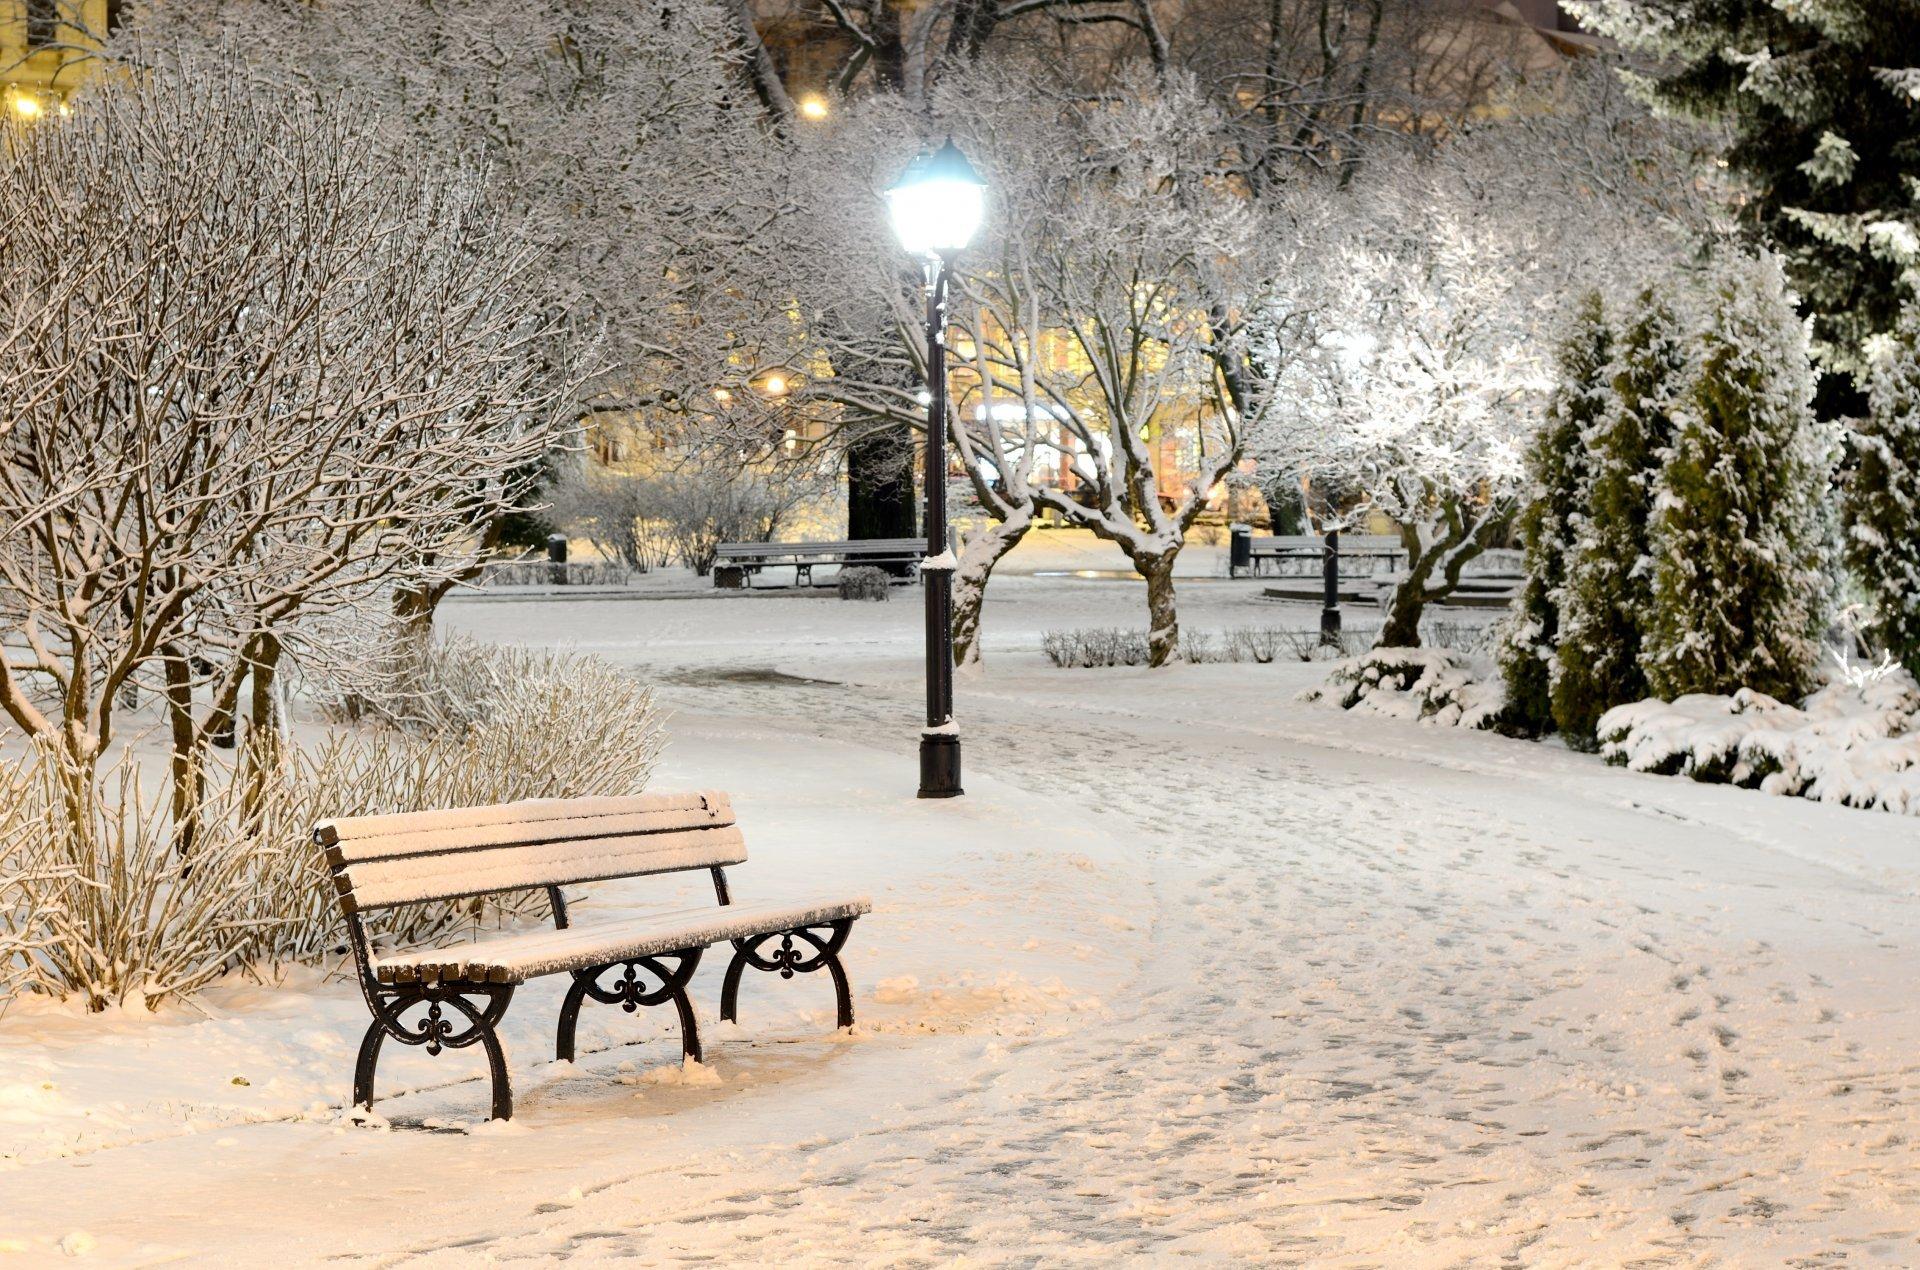 bench shop winter snow night lamps light nature park tree HD wallpaper 1920x1270